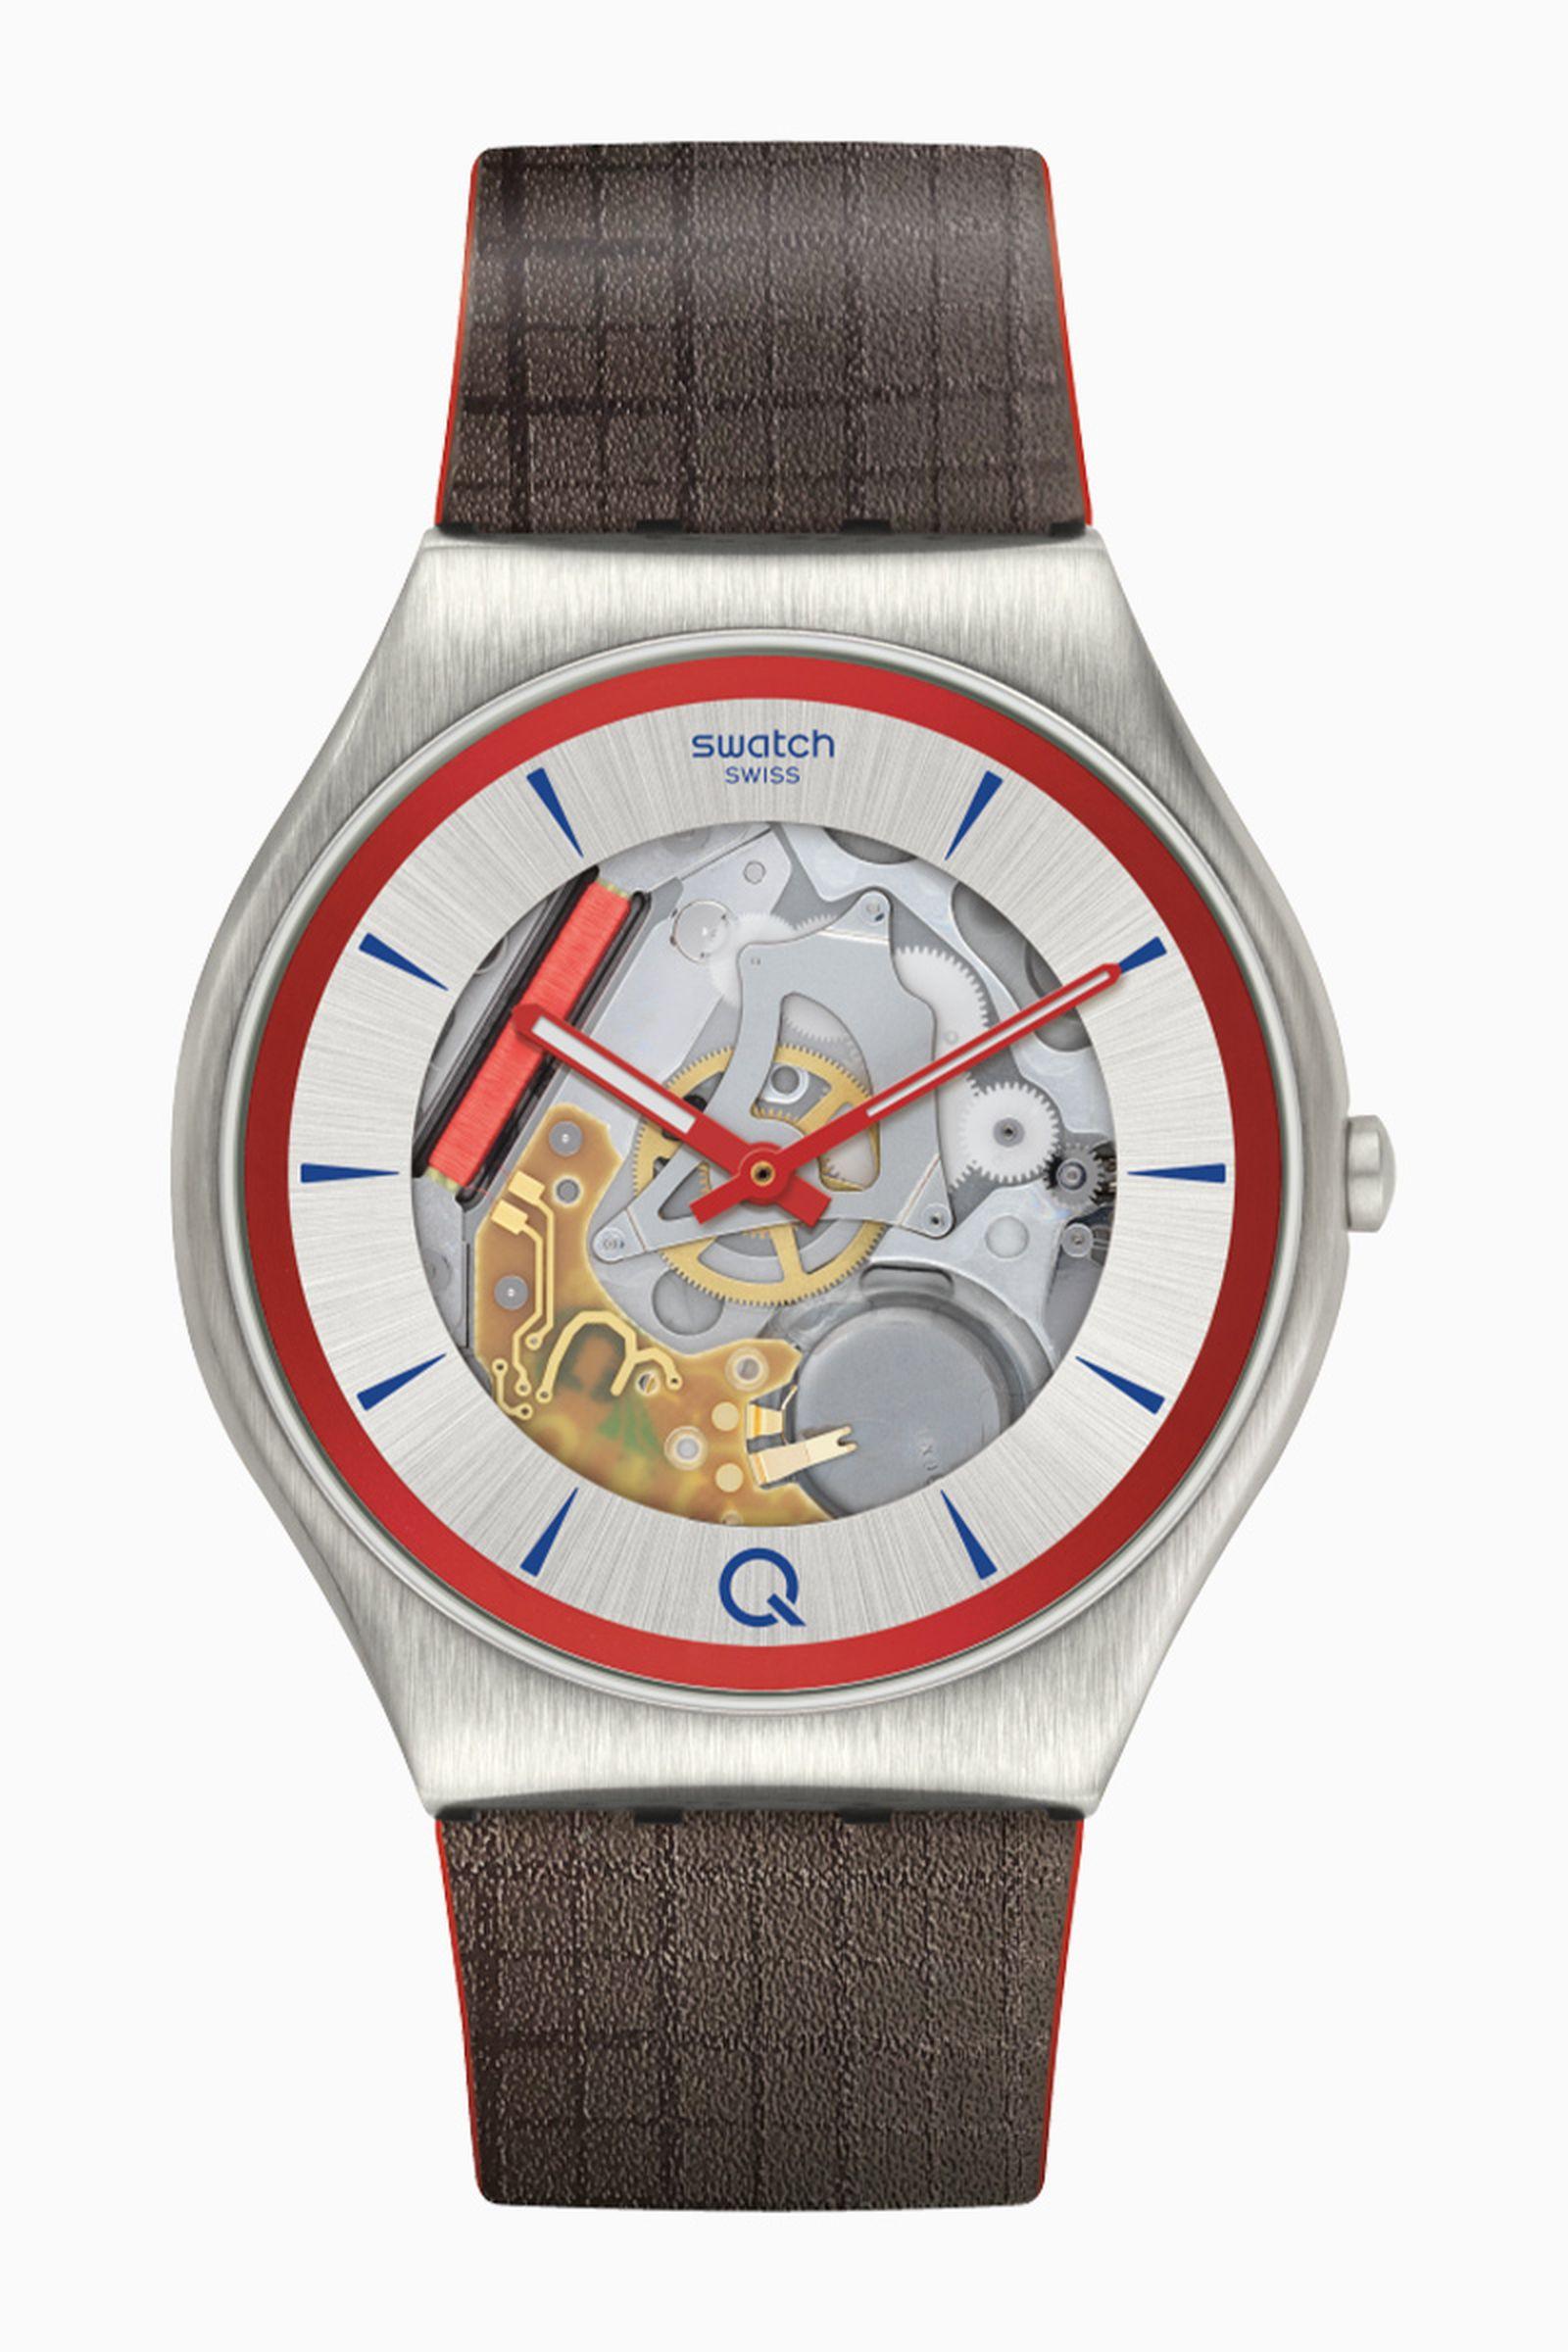 swatch-q-james-bond-no-time-to-die-4